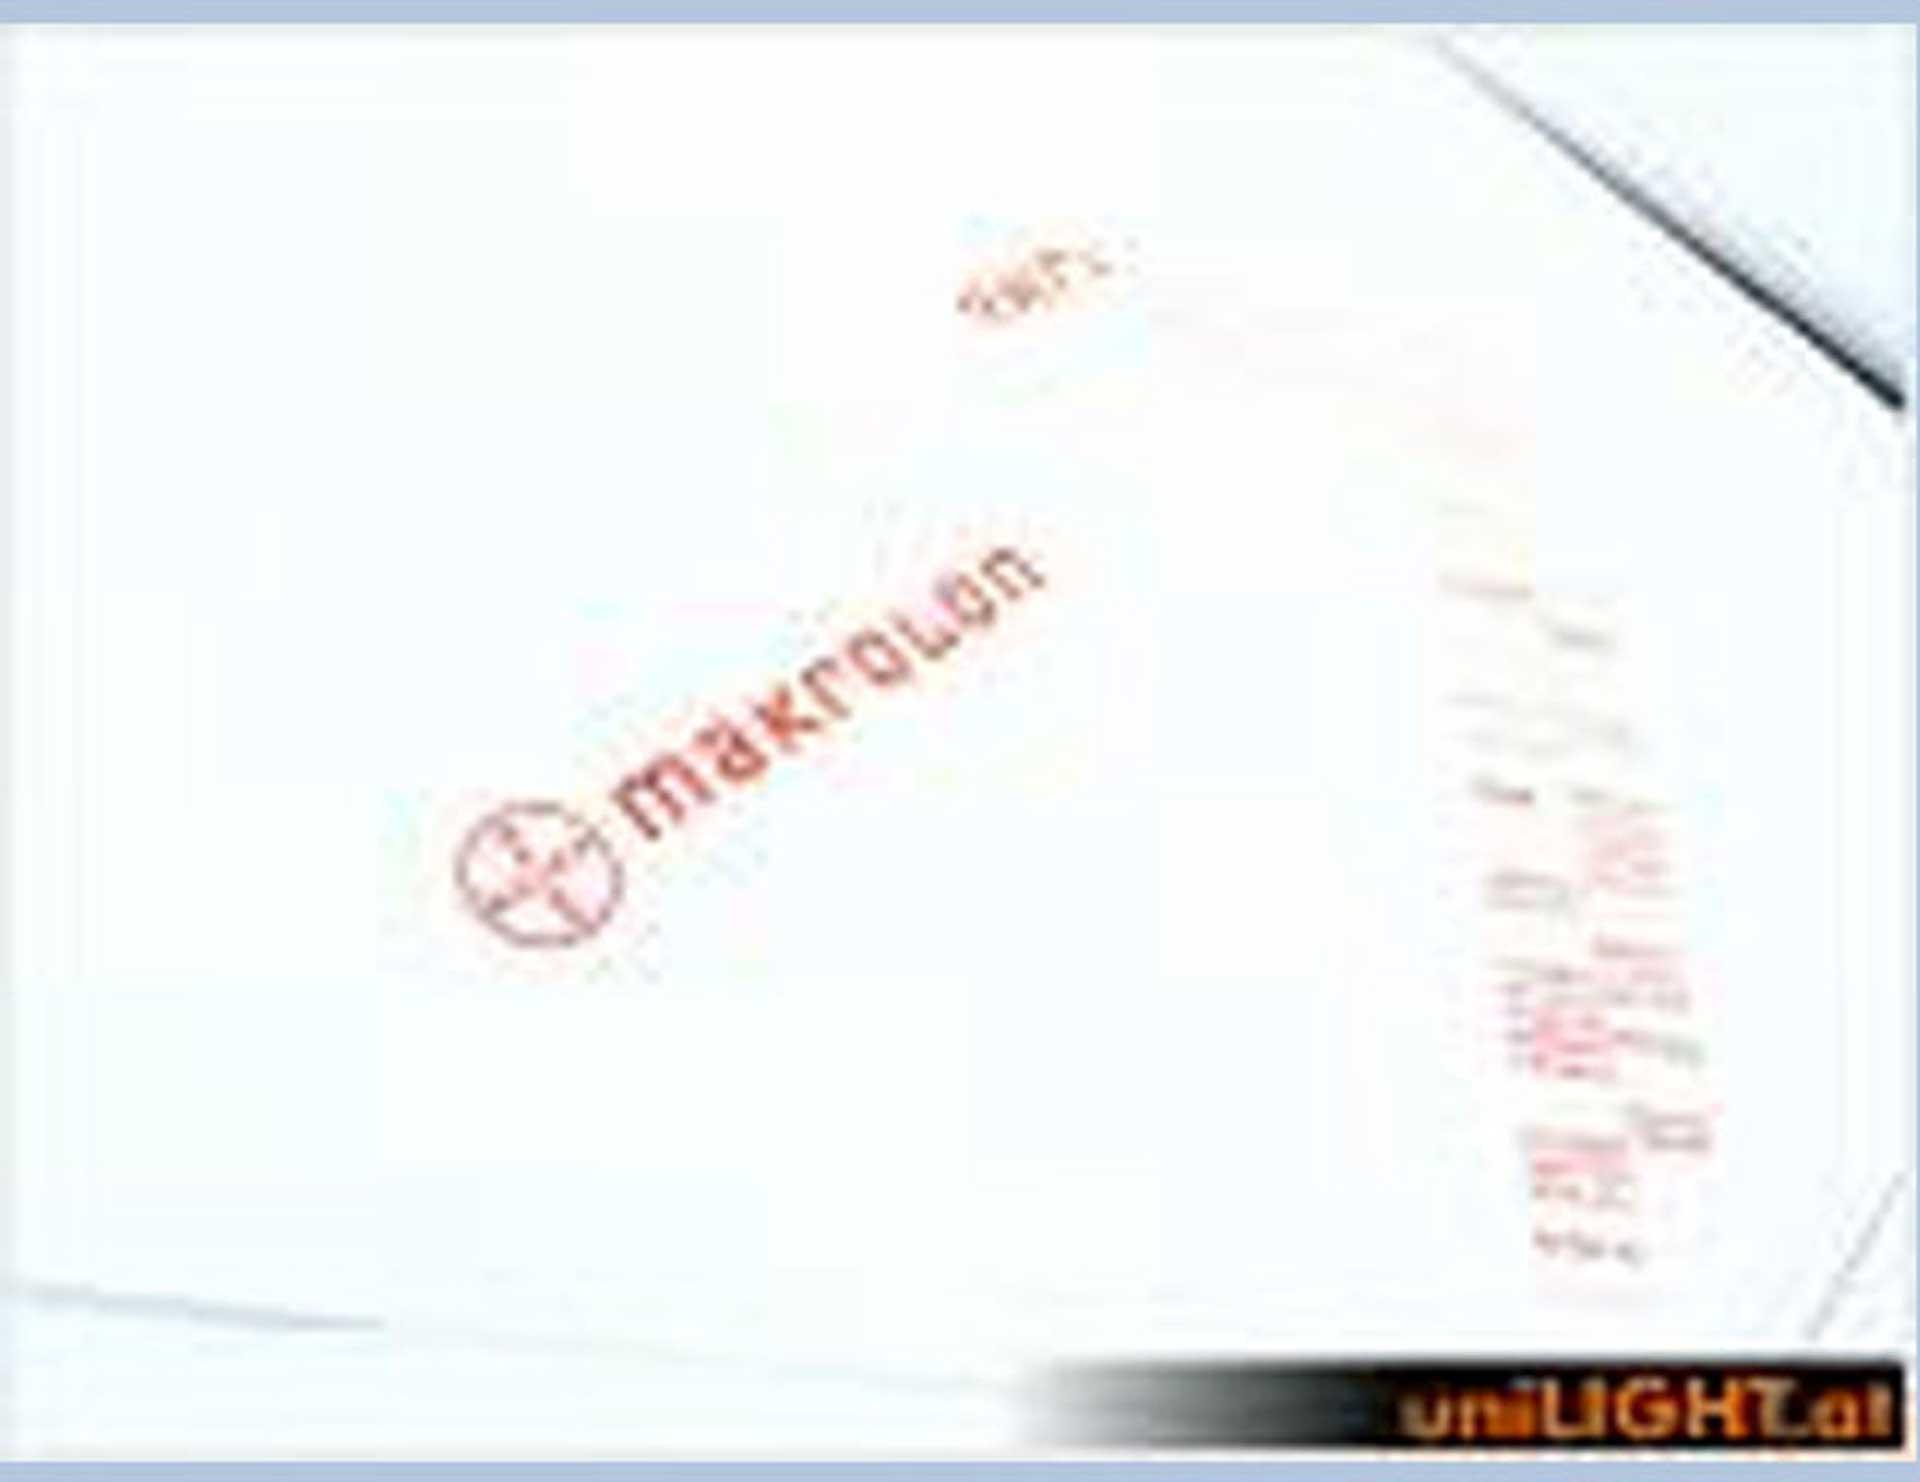 UNILIGHT Makrolon zum Tiefziehen 1.0mm